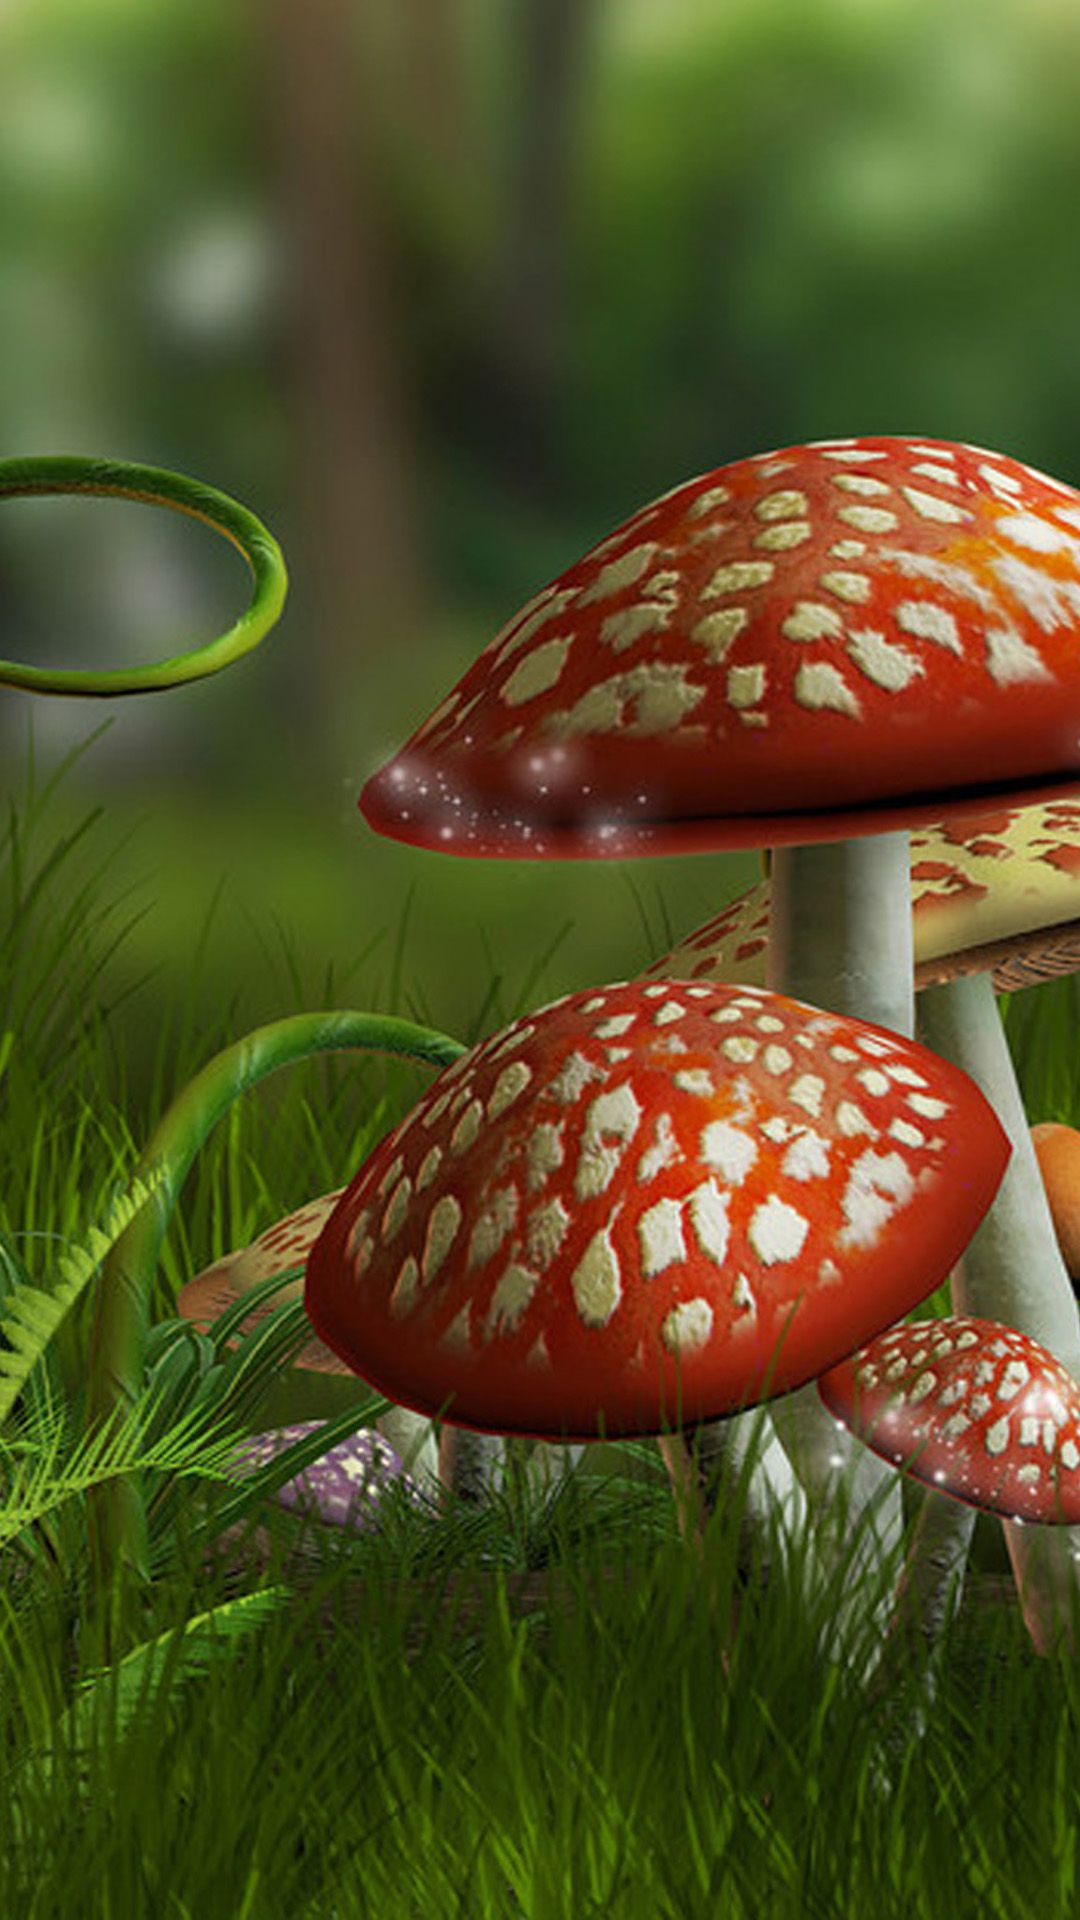 mushroom wallpaper phone - photo #4